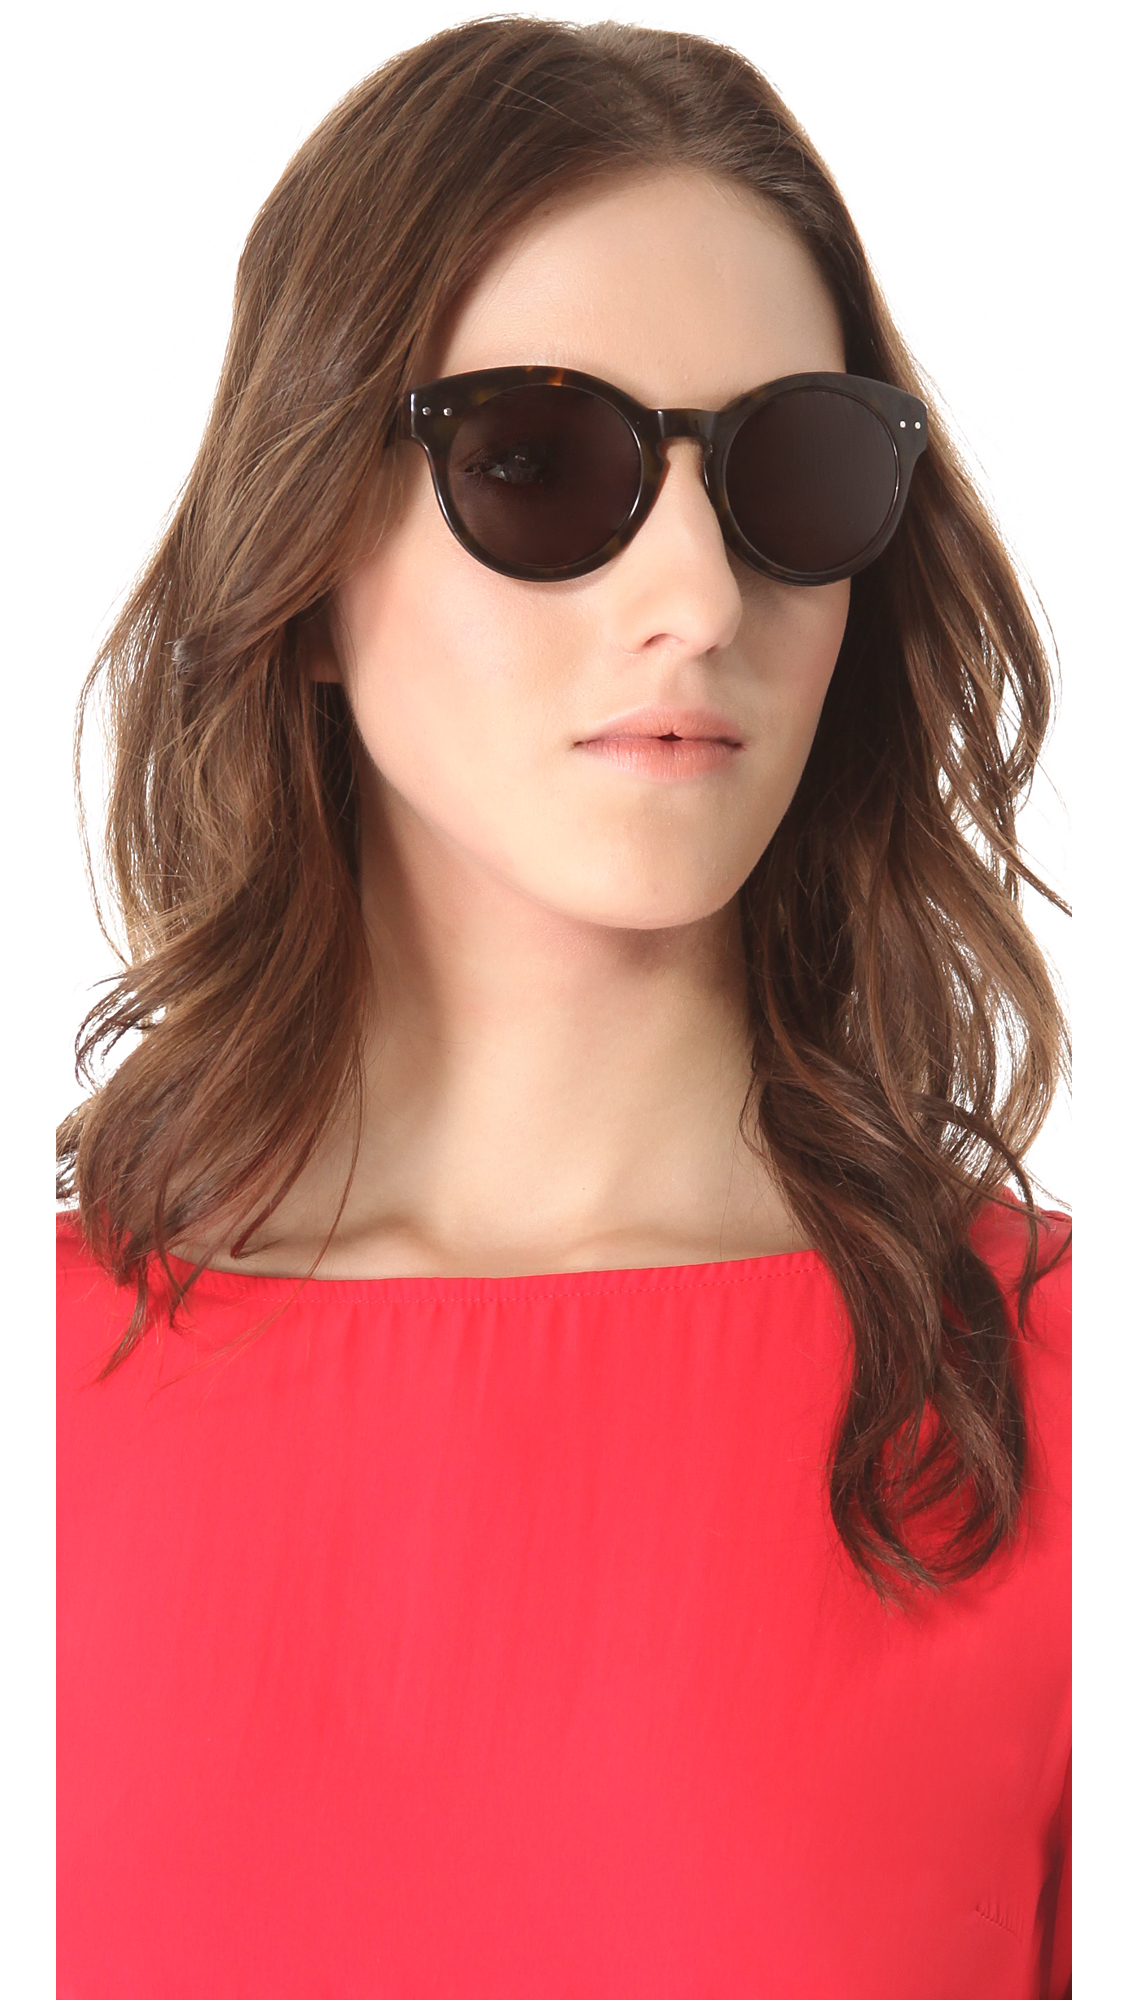 52cc260495 Madewell Hepcat Sunglasses